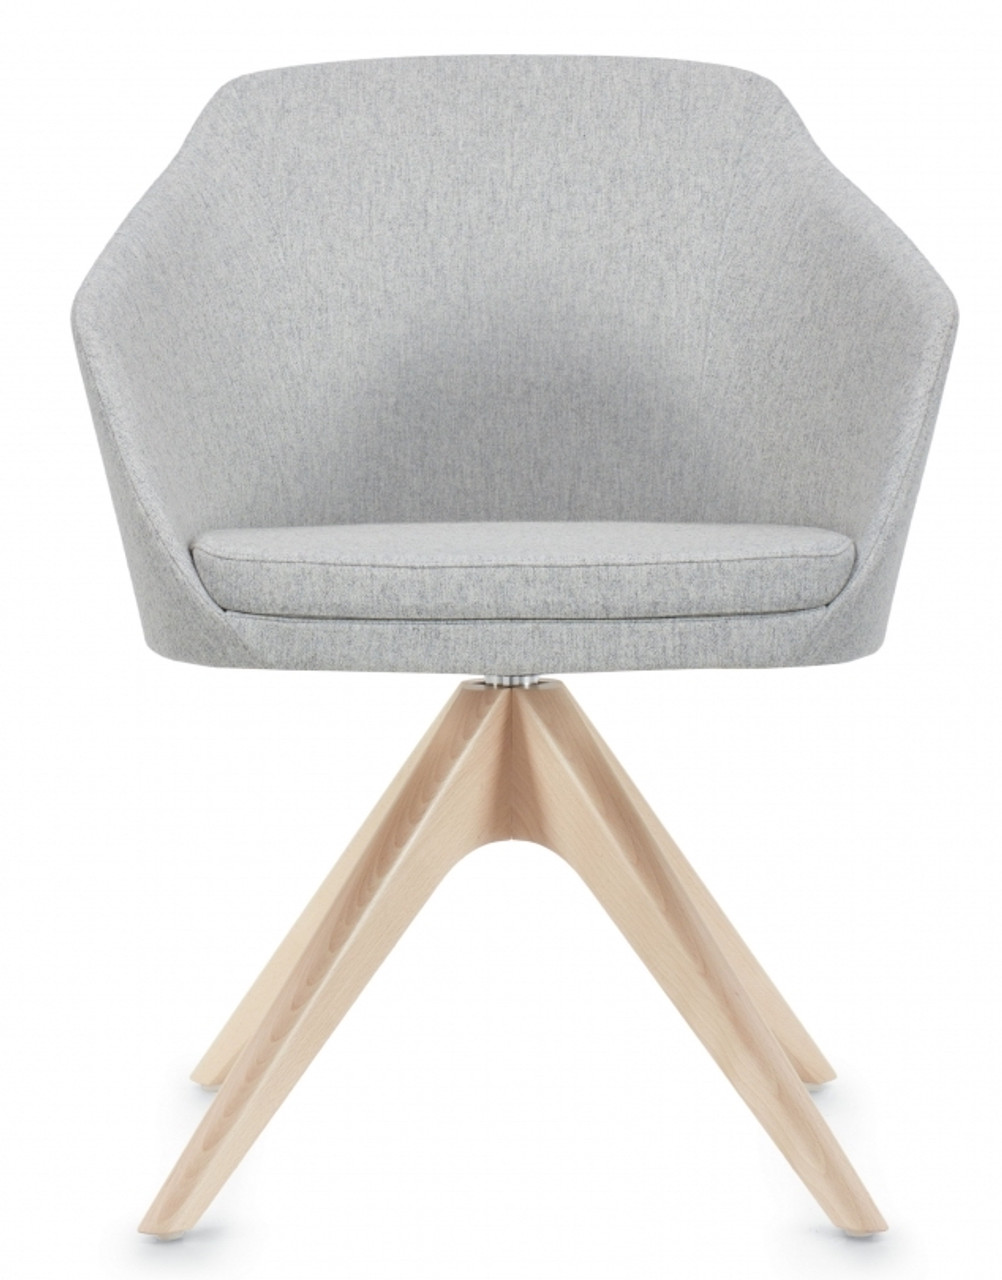 Enjoyable Global Drift Guest Chair With Wood Swivel Base Theyellowbook Wood Chair Design Ideas Theyellowbookinfo